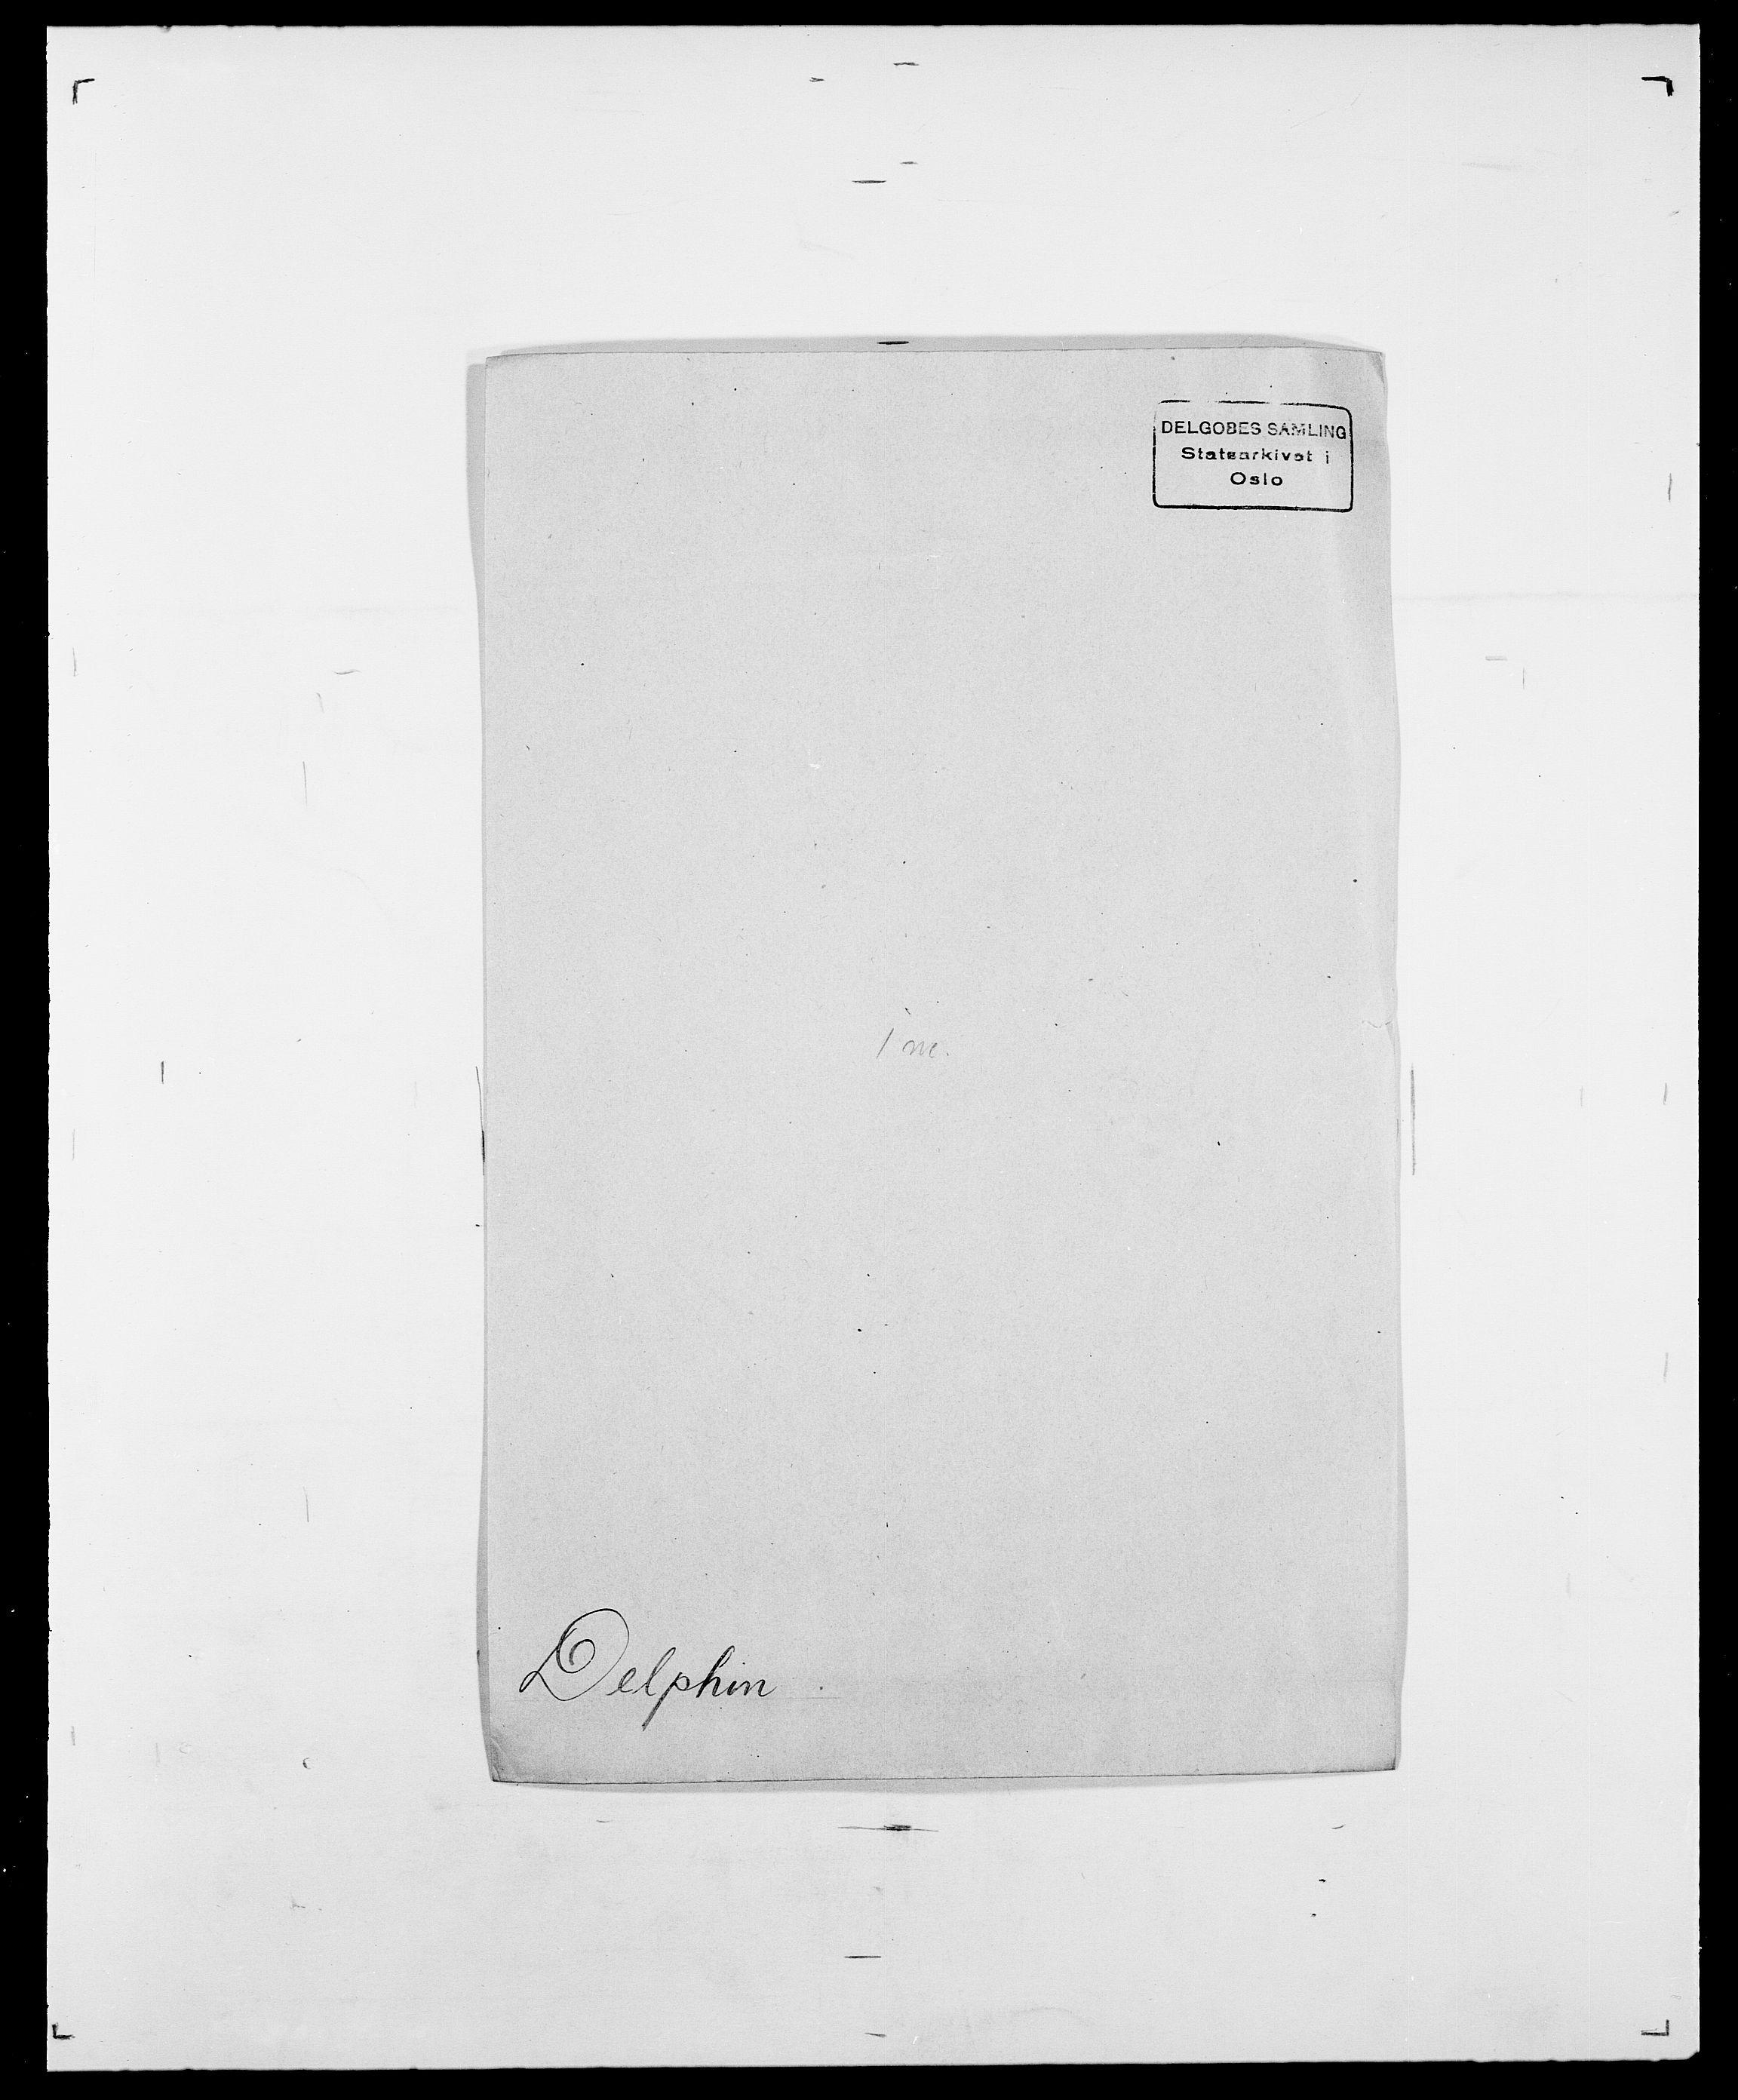 SAO, Delgobe, Charles Antoine - samling, D/Da/L0009: Dahl - v. Düren, s. 486